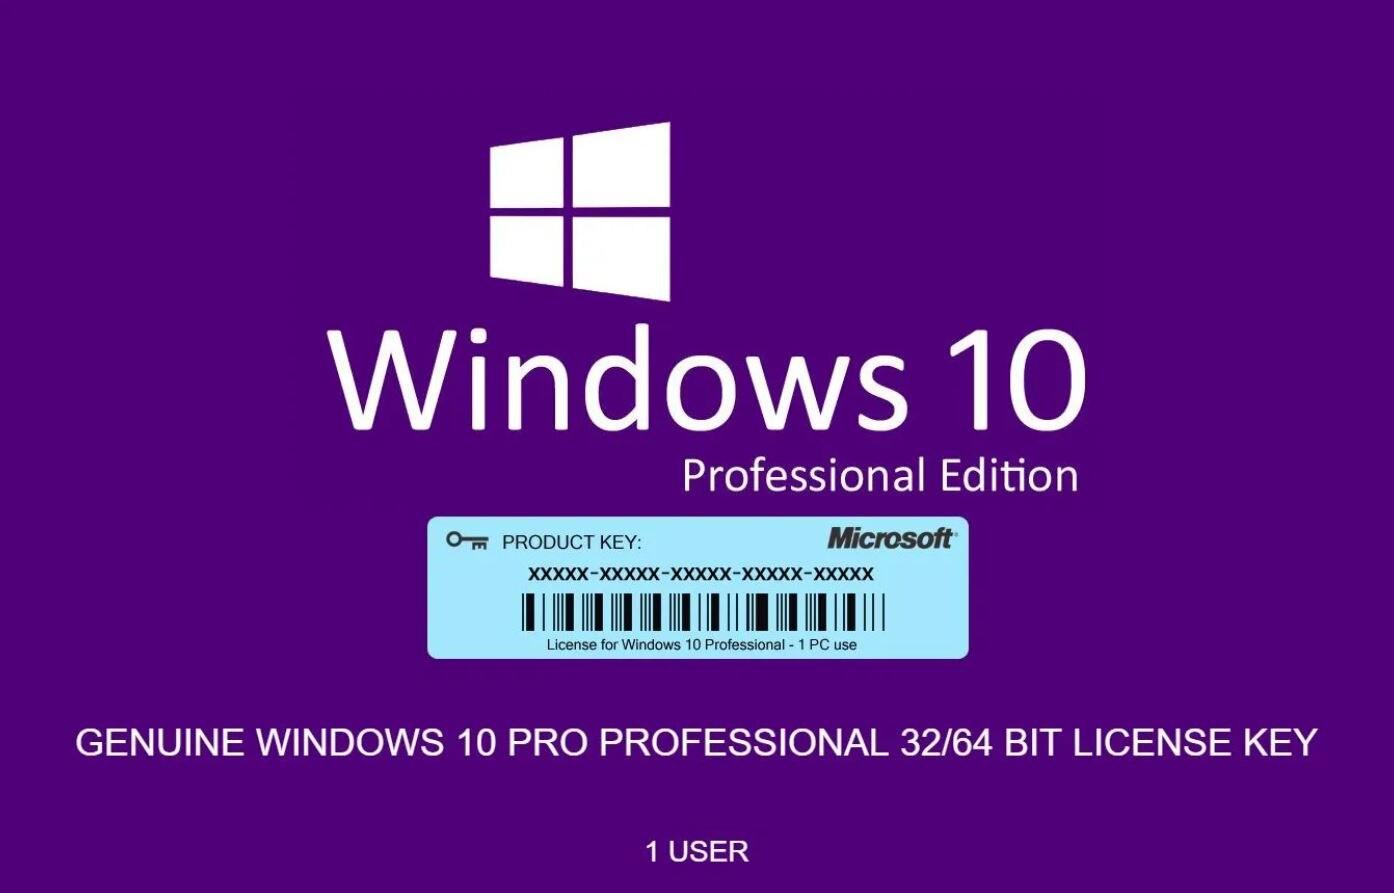 Windows 10 Pro 32/64 bit 2021 Instant delivery - Multilanguage - Original License Key